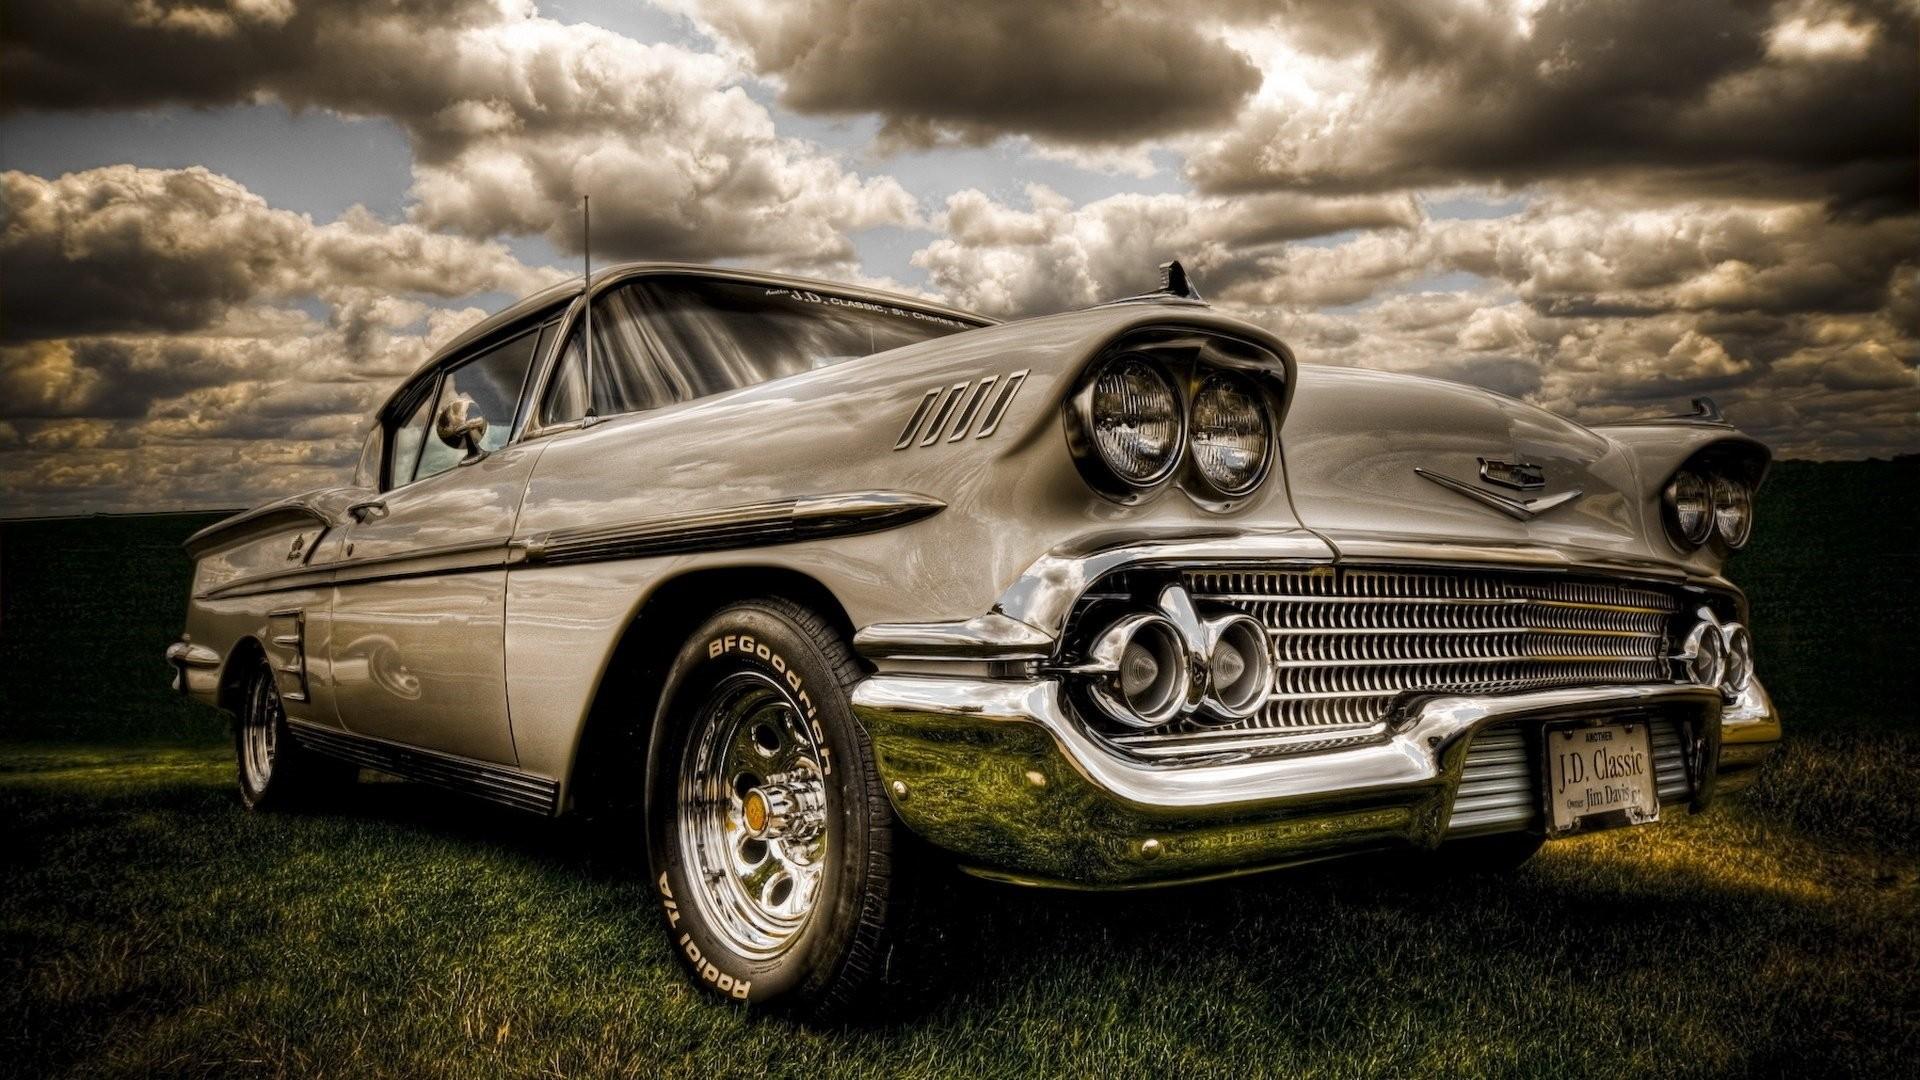 Classic Car High Quality